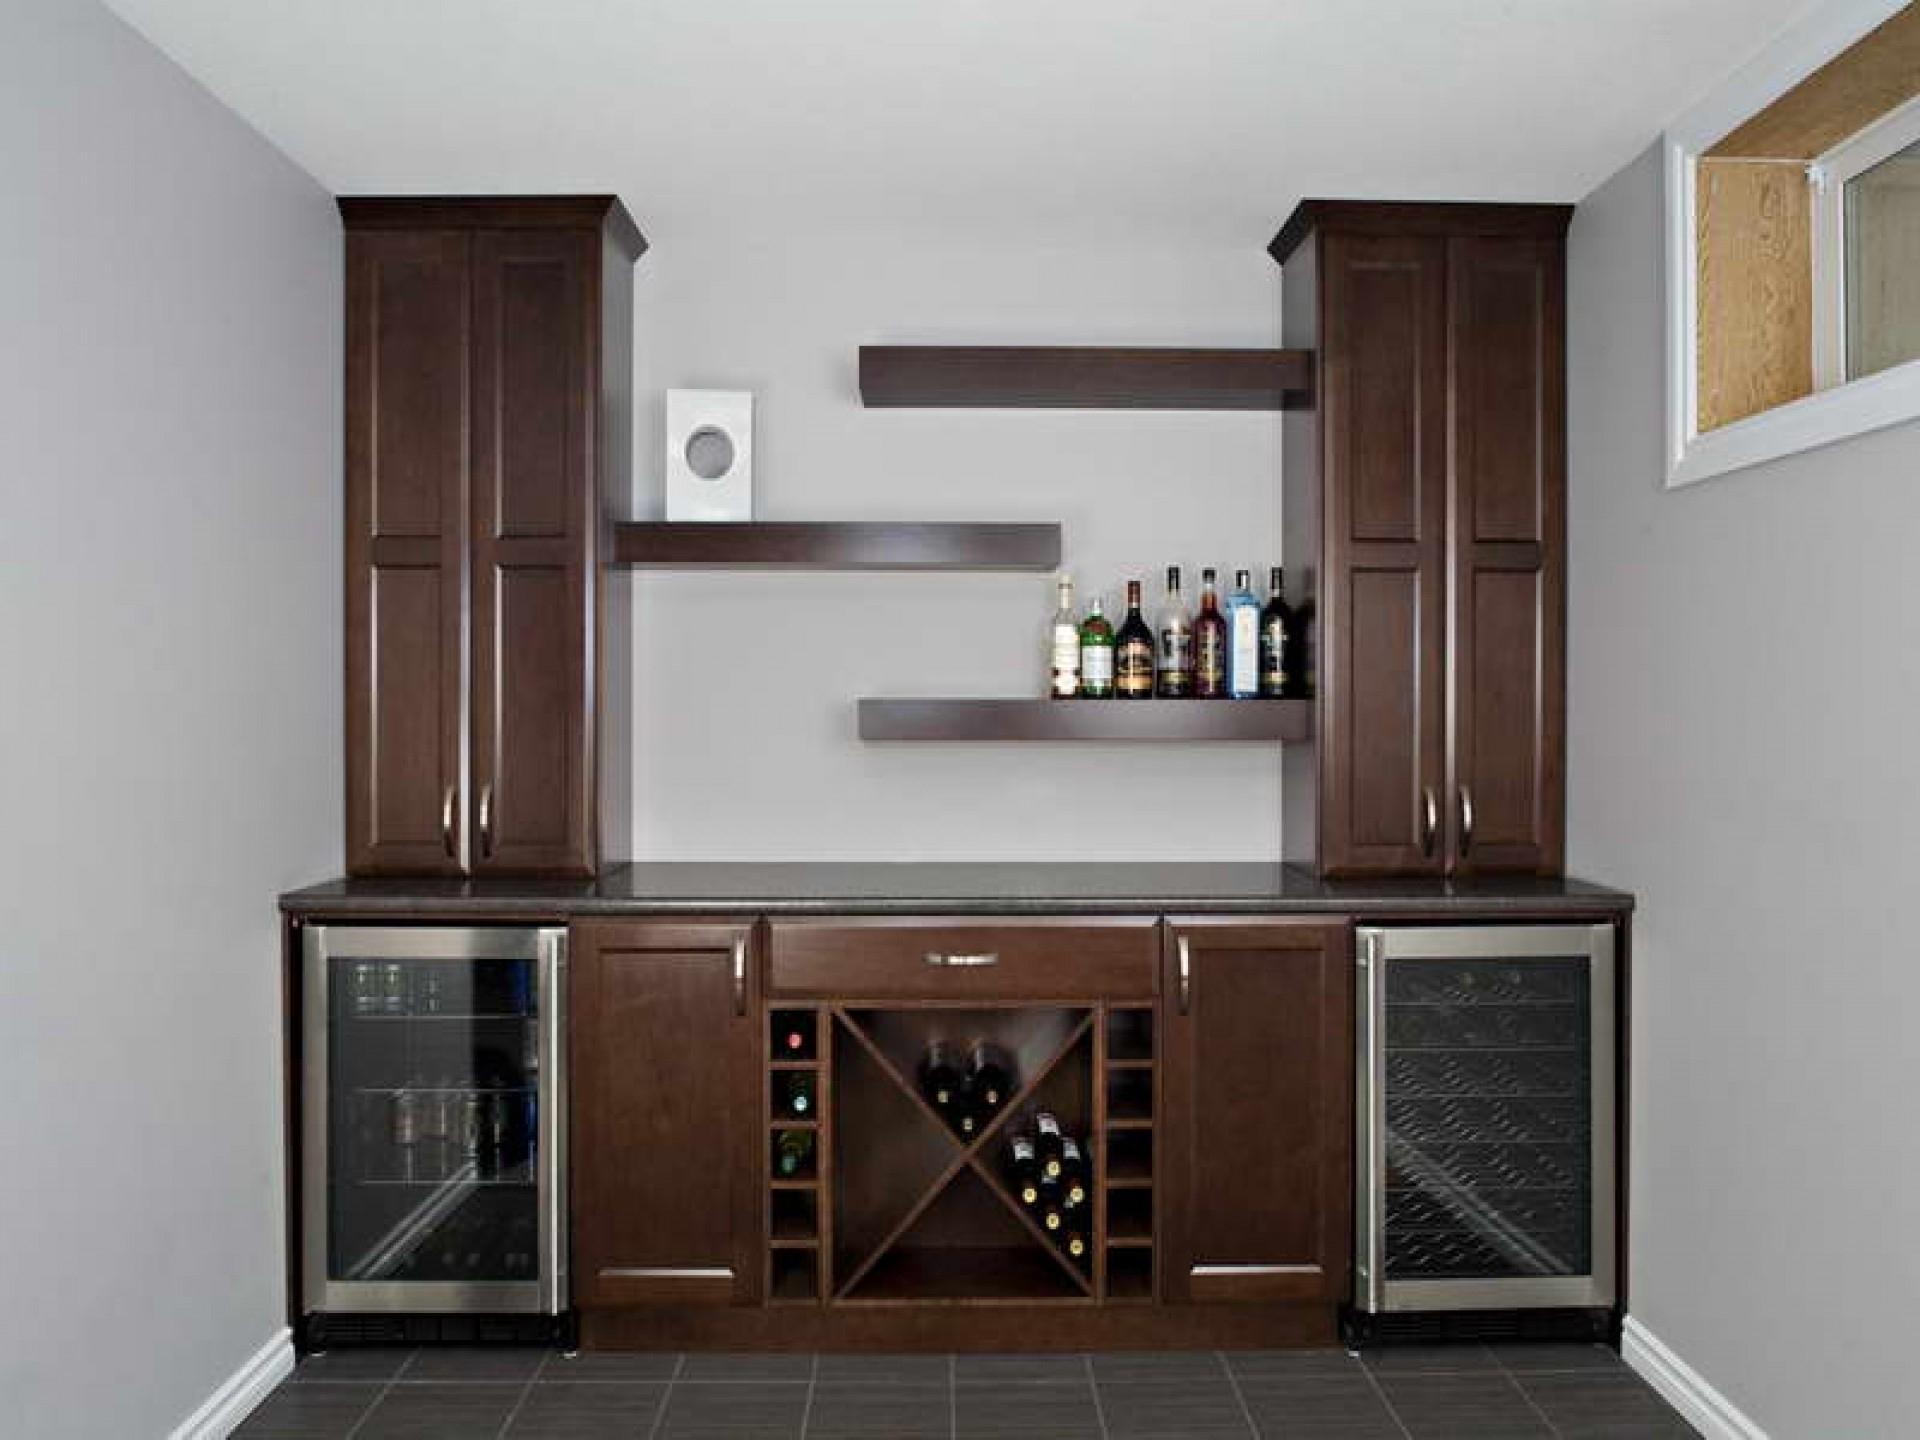 Home Design Floating Glass Bar Shelves Cabinetry Electrical Regarding Floating Glass Shelves For Bar (View 14 of 15)